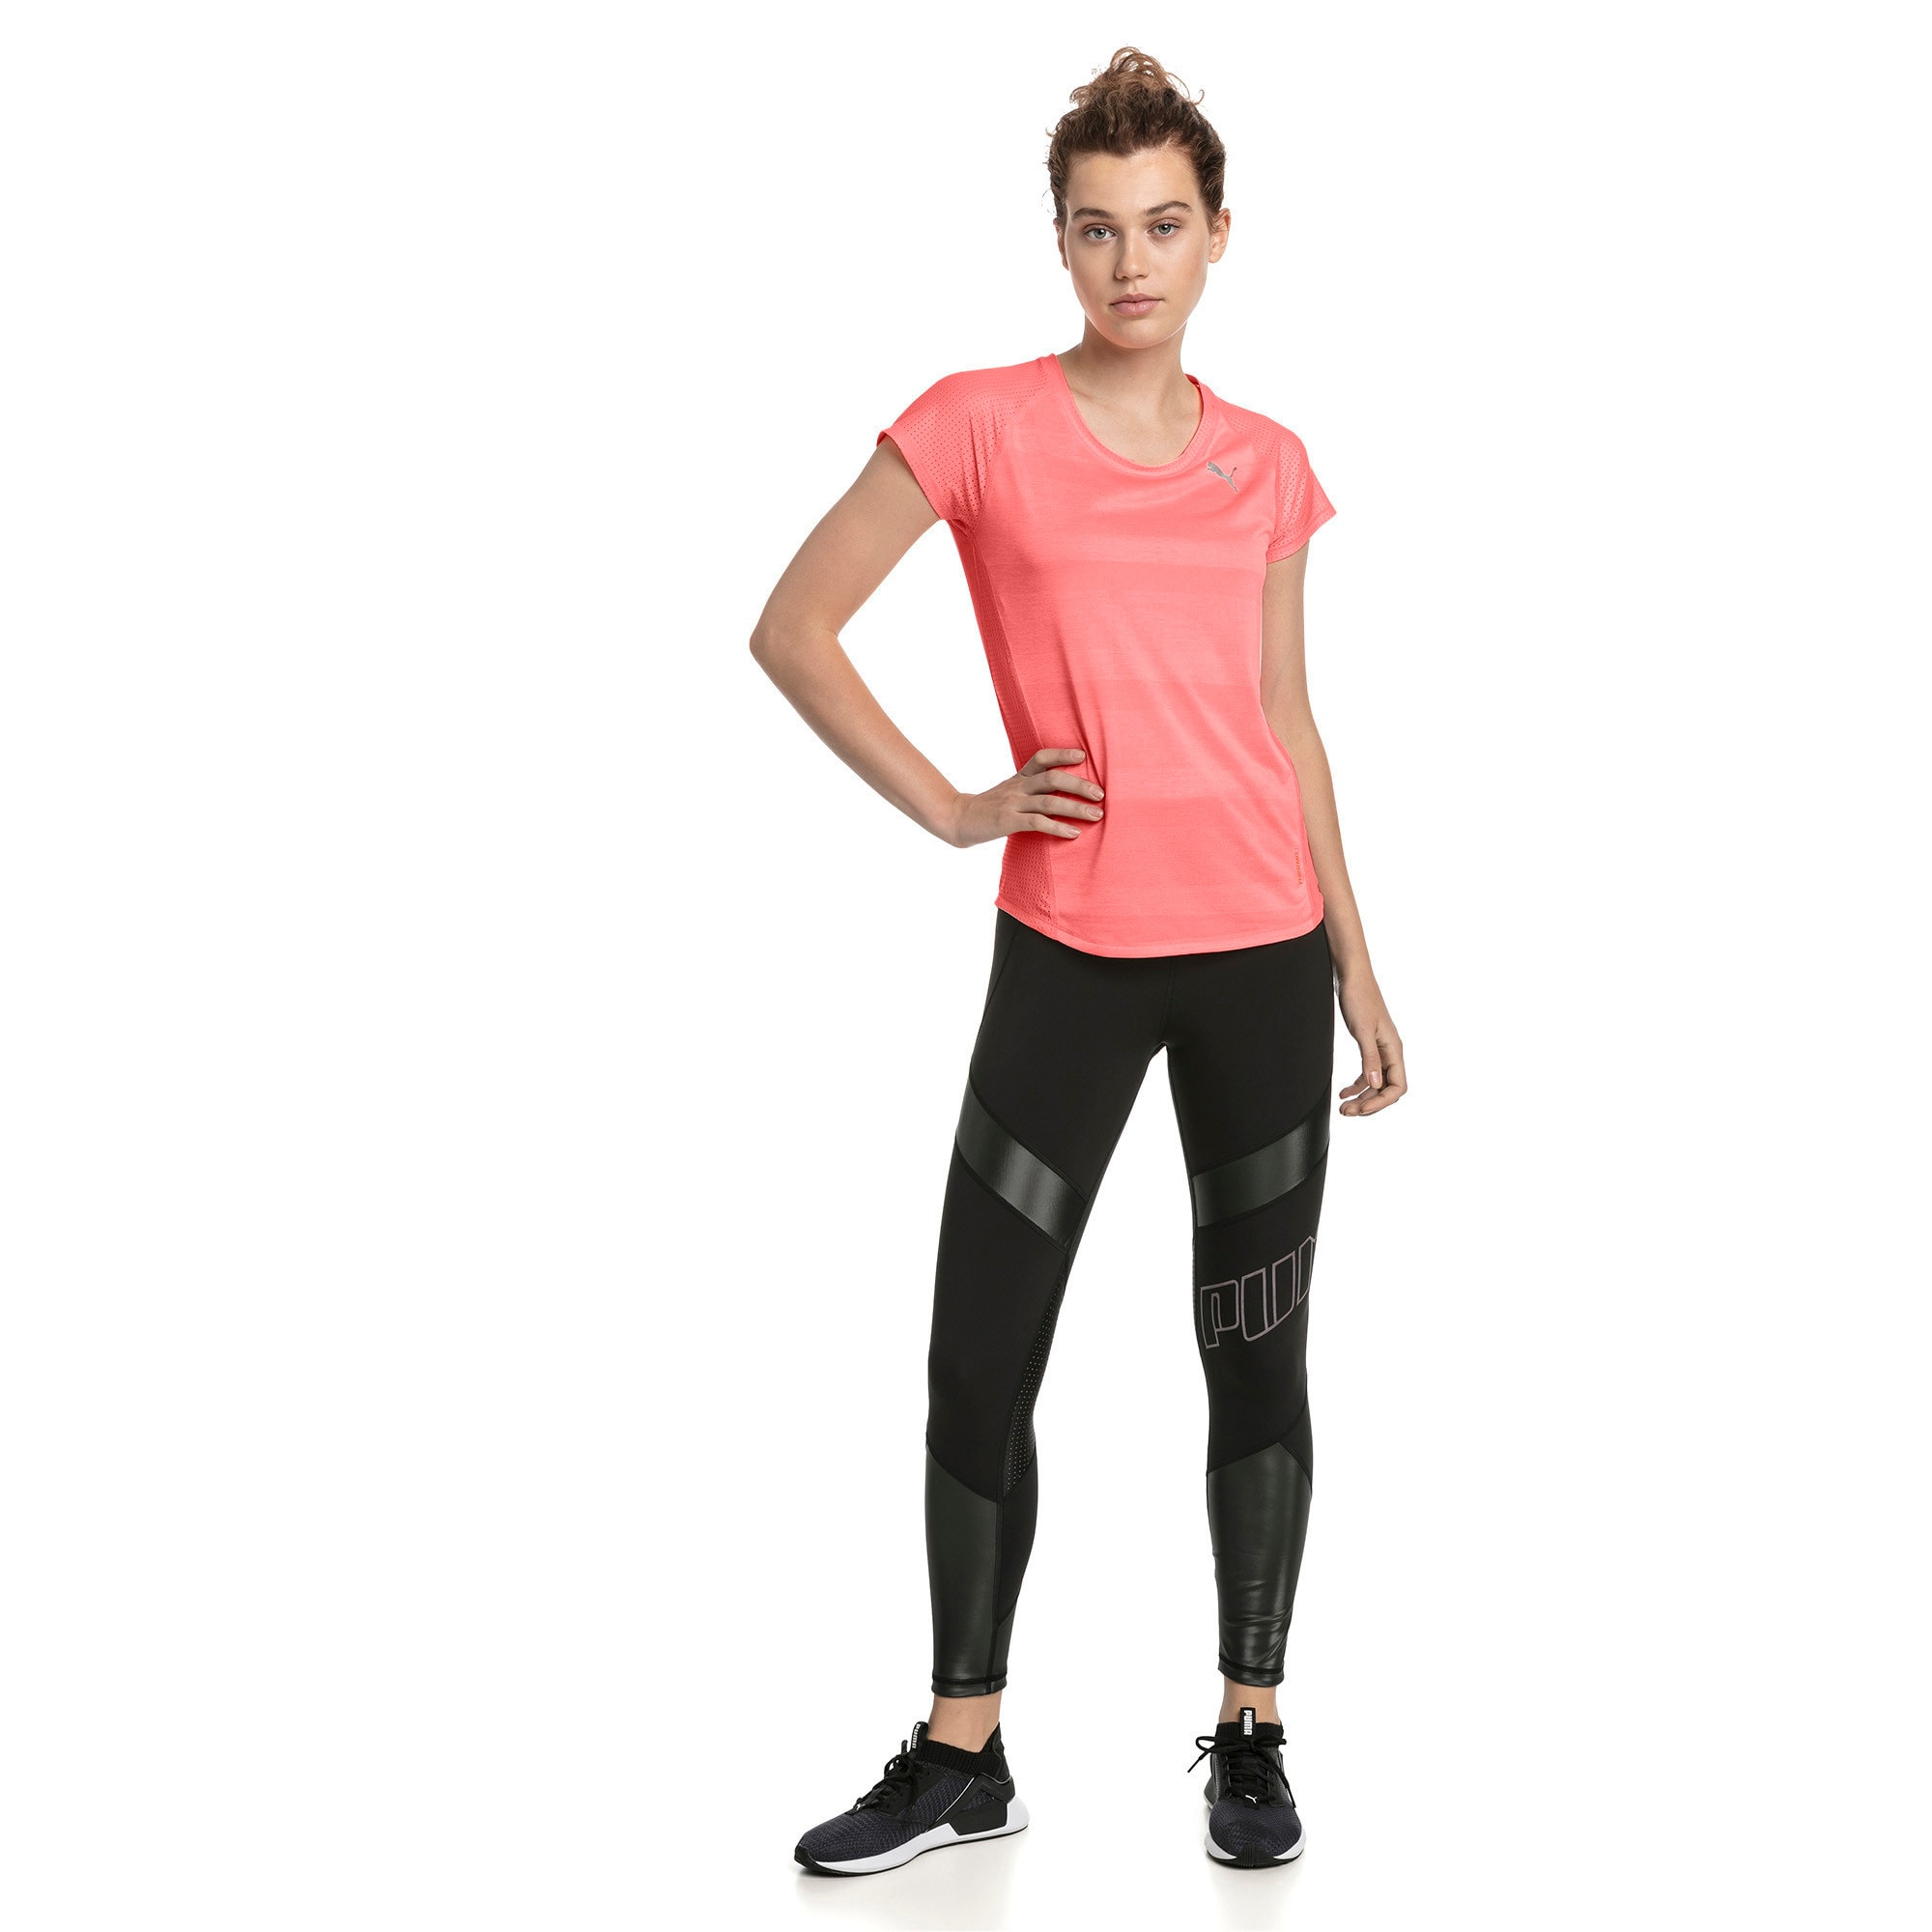 Thumbnail 3 of Thermo-R+ Short Sleeve Women's Running Tee, Bright Peach Heather, medium-IND